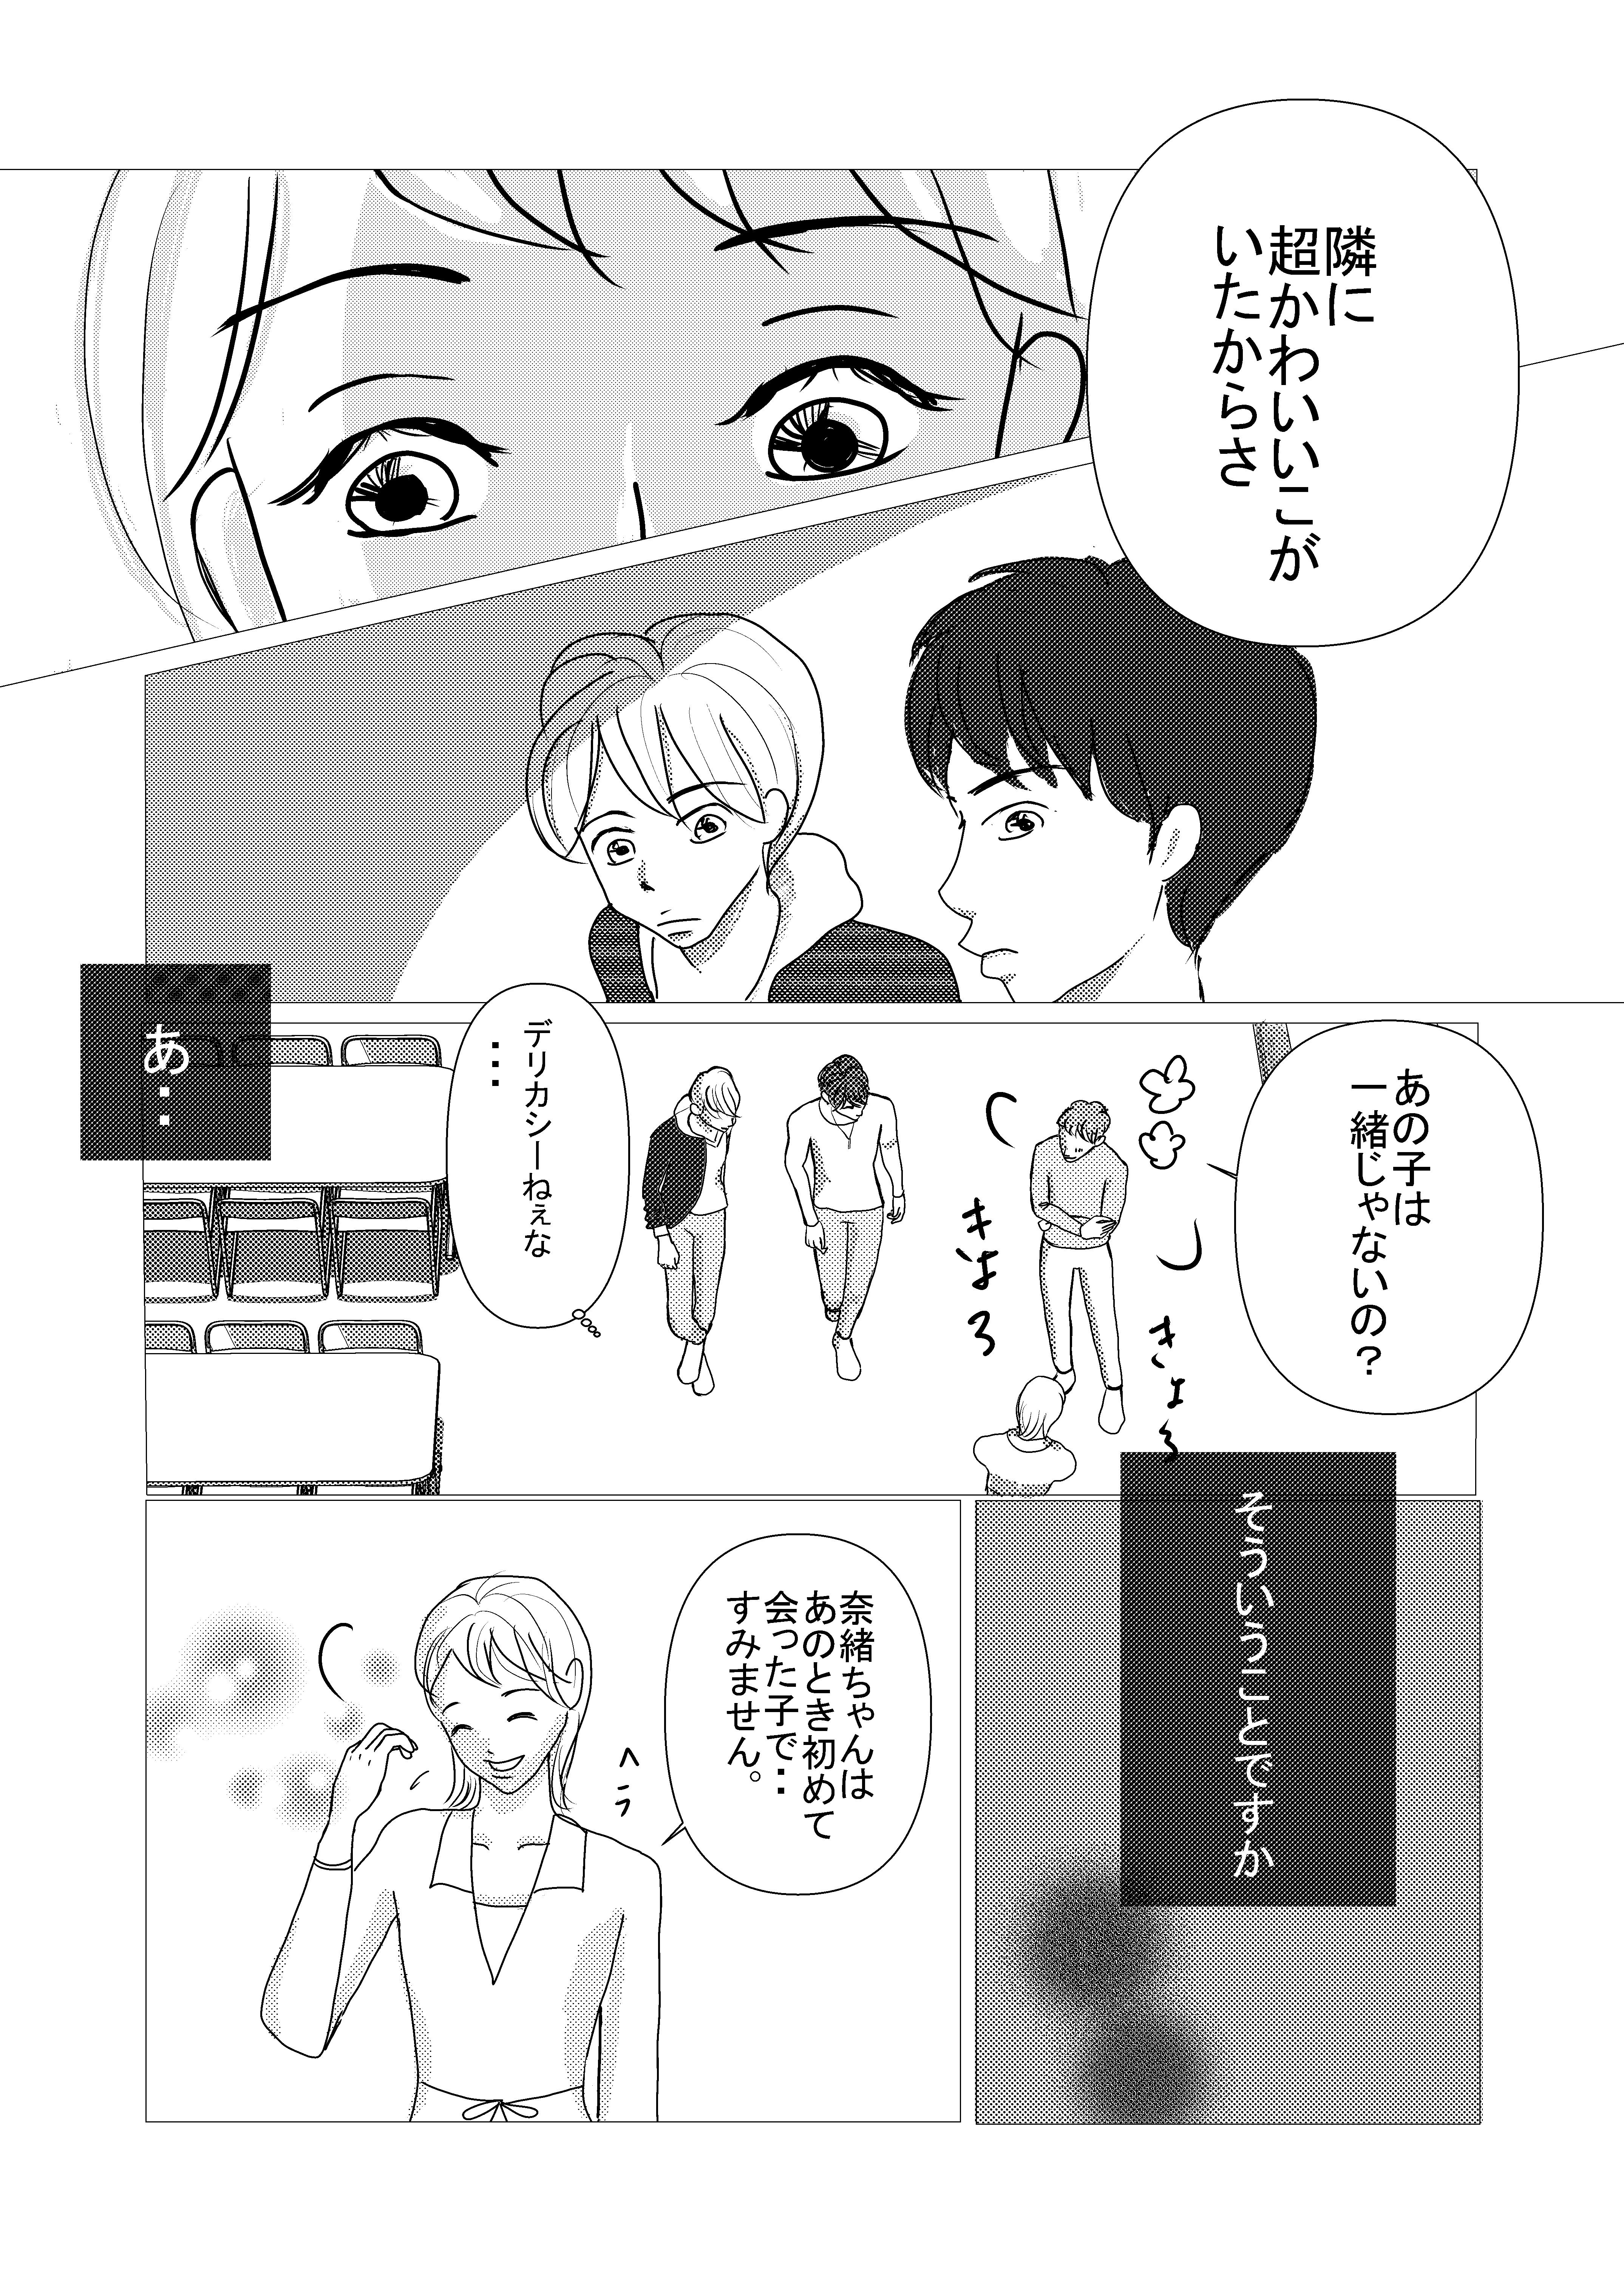 恋愛漫画/大学生/社会人/shoujyo manga/米加夢/8ページ